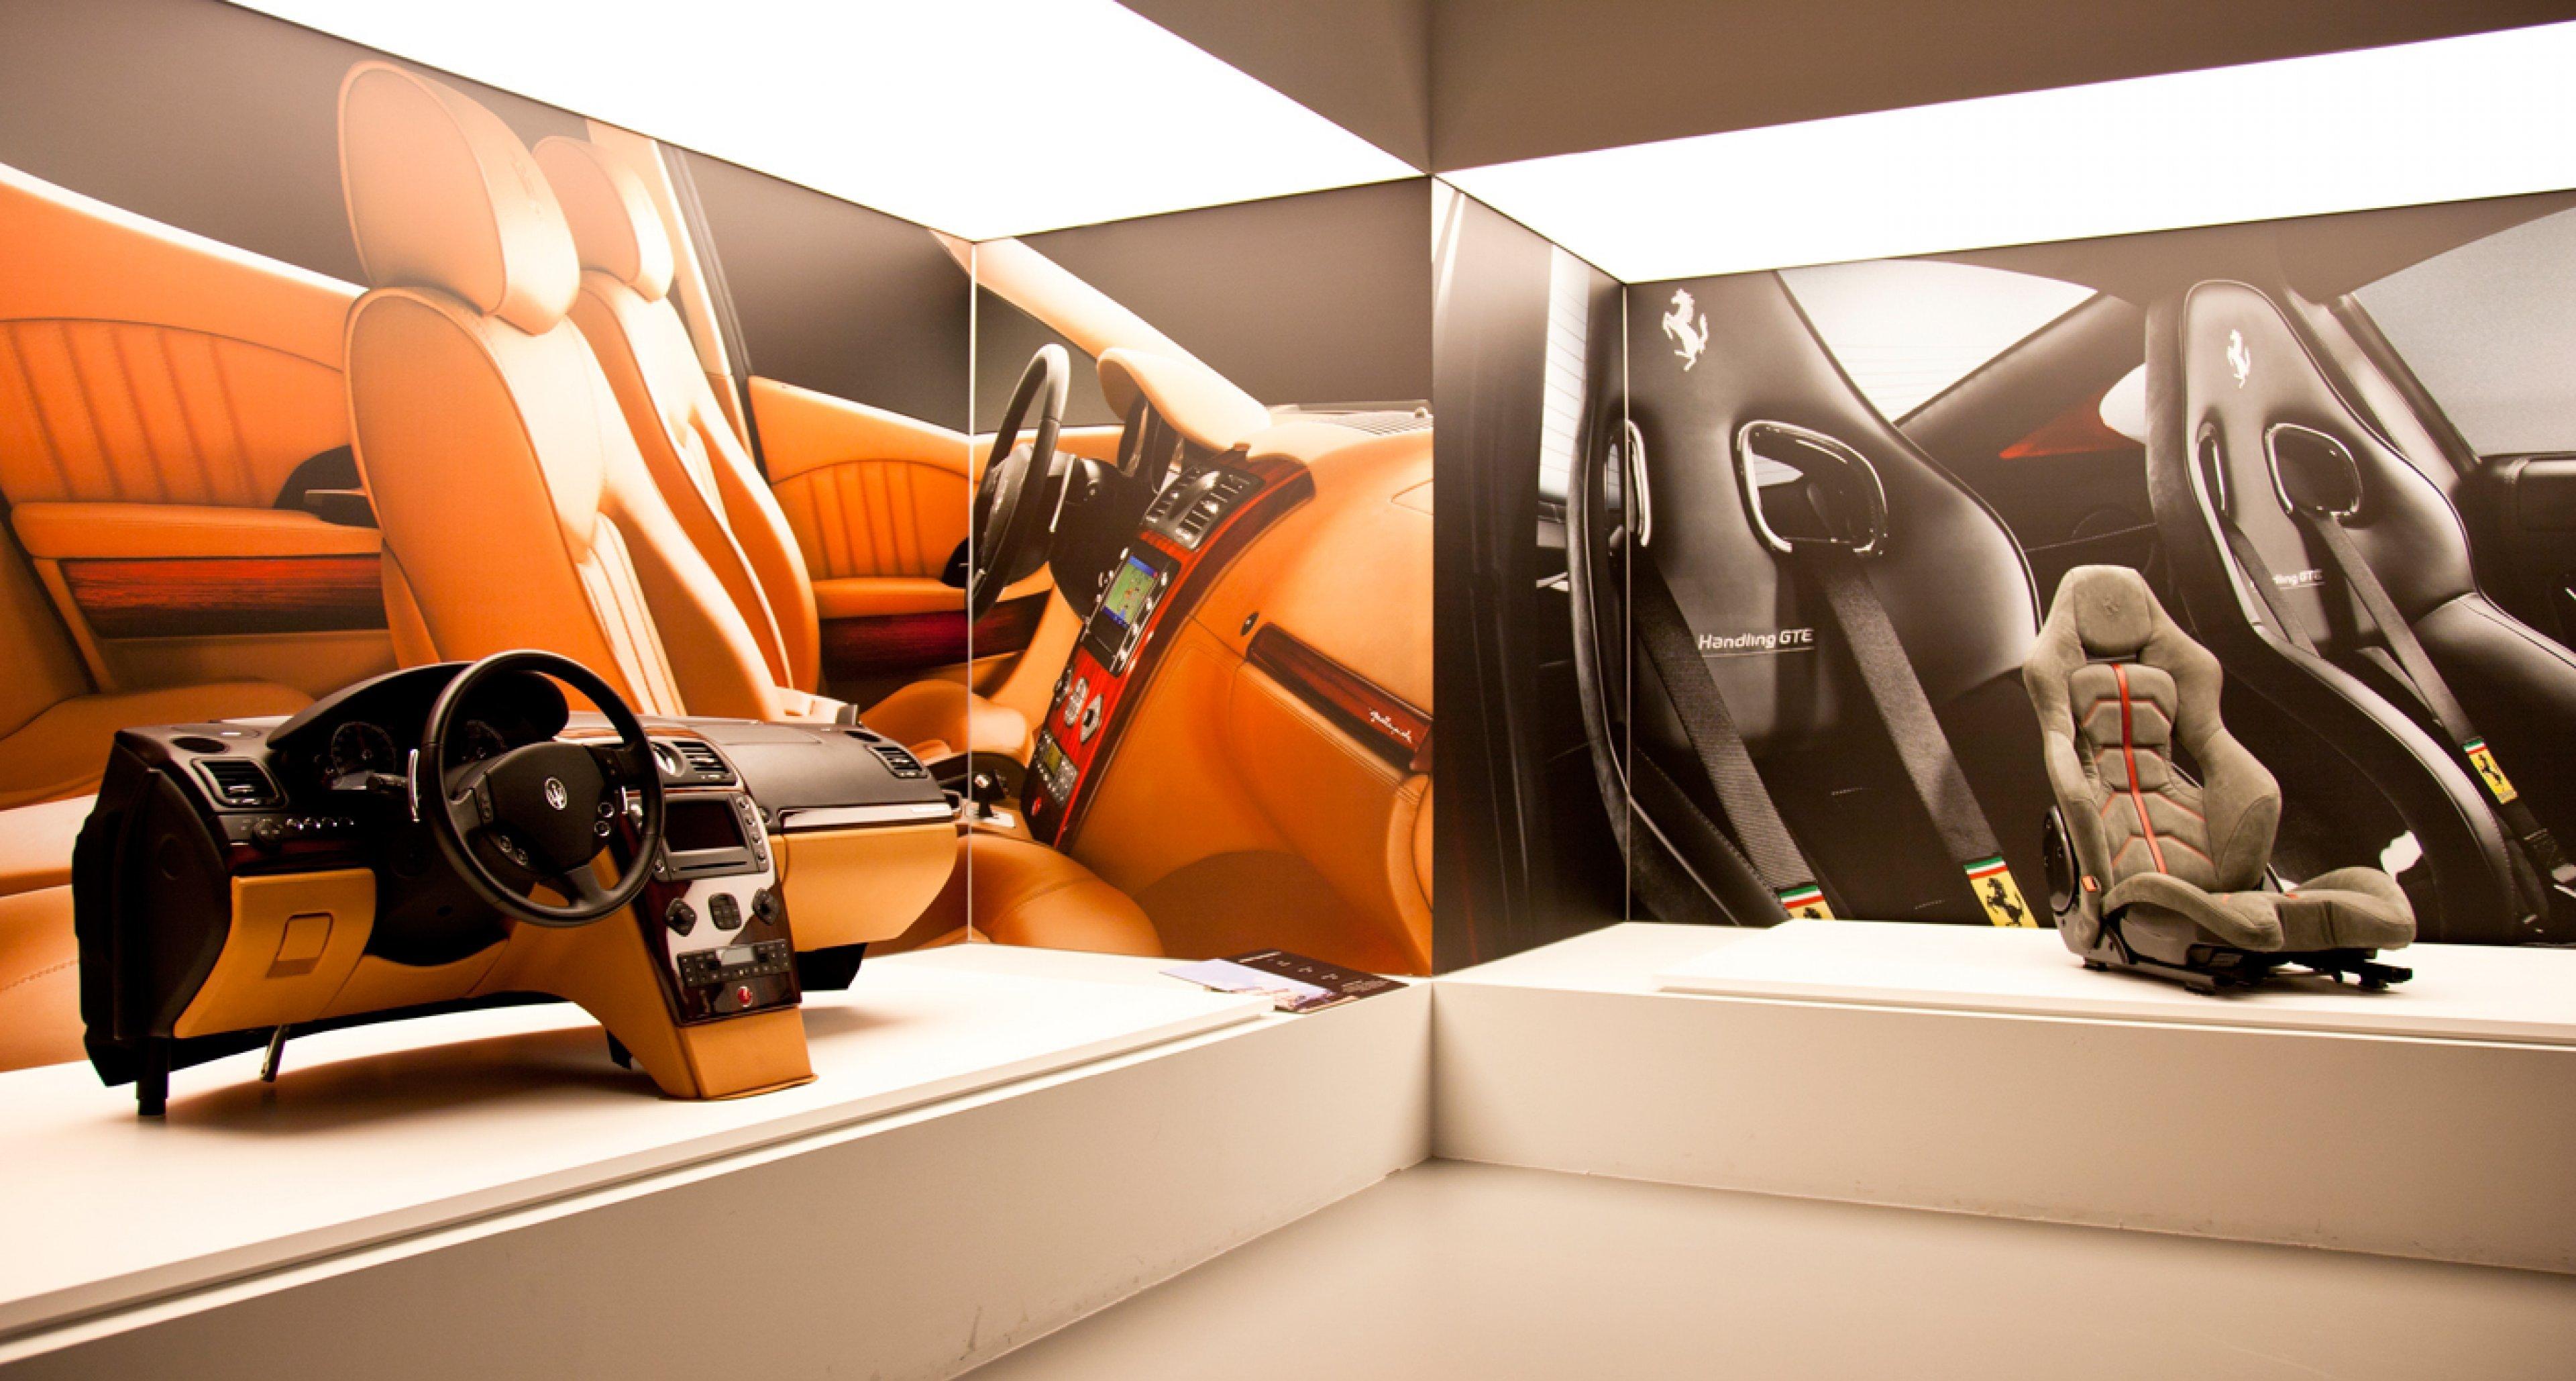 Seats for Maserati Quattroporte and Ferrari 599 GTB at Poltrona Frau Museum.